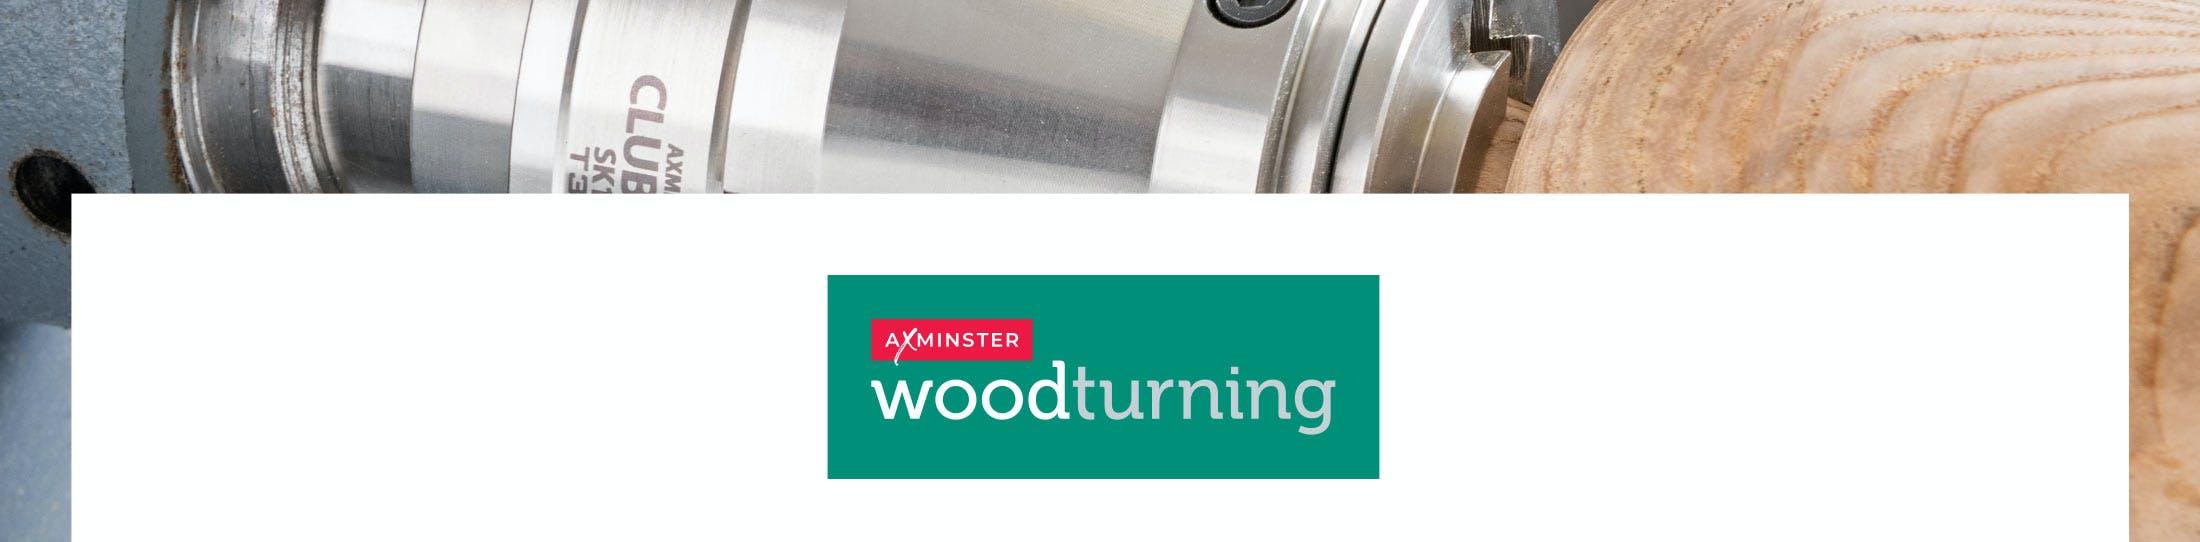 Axminster Woodturning